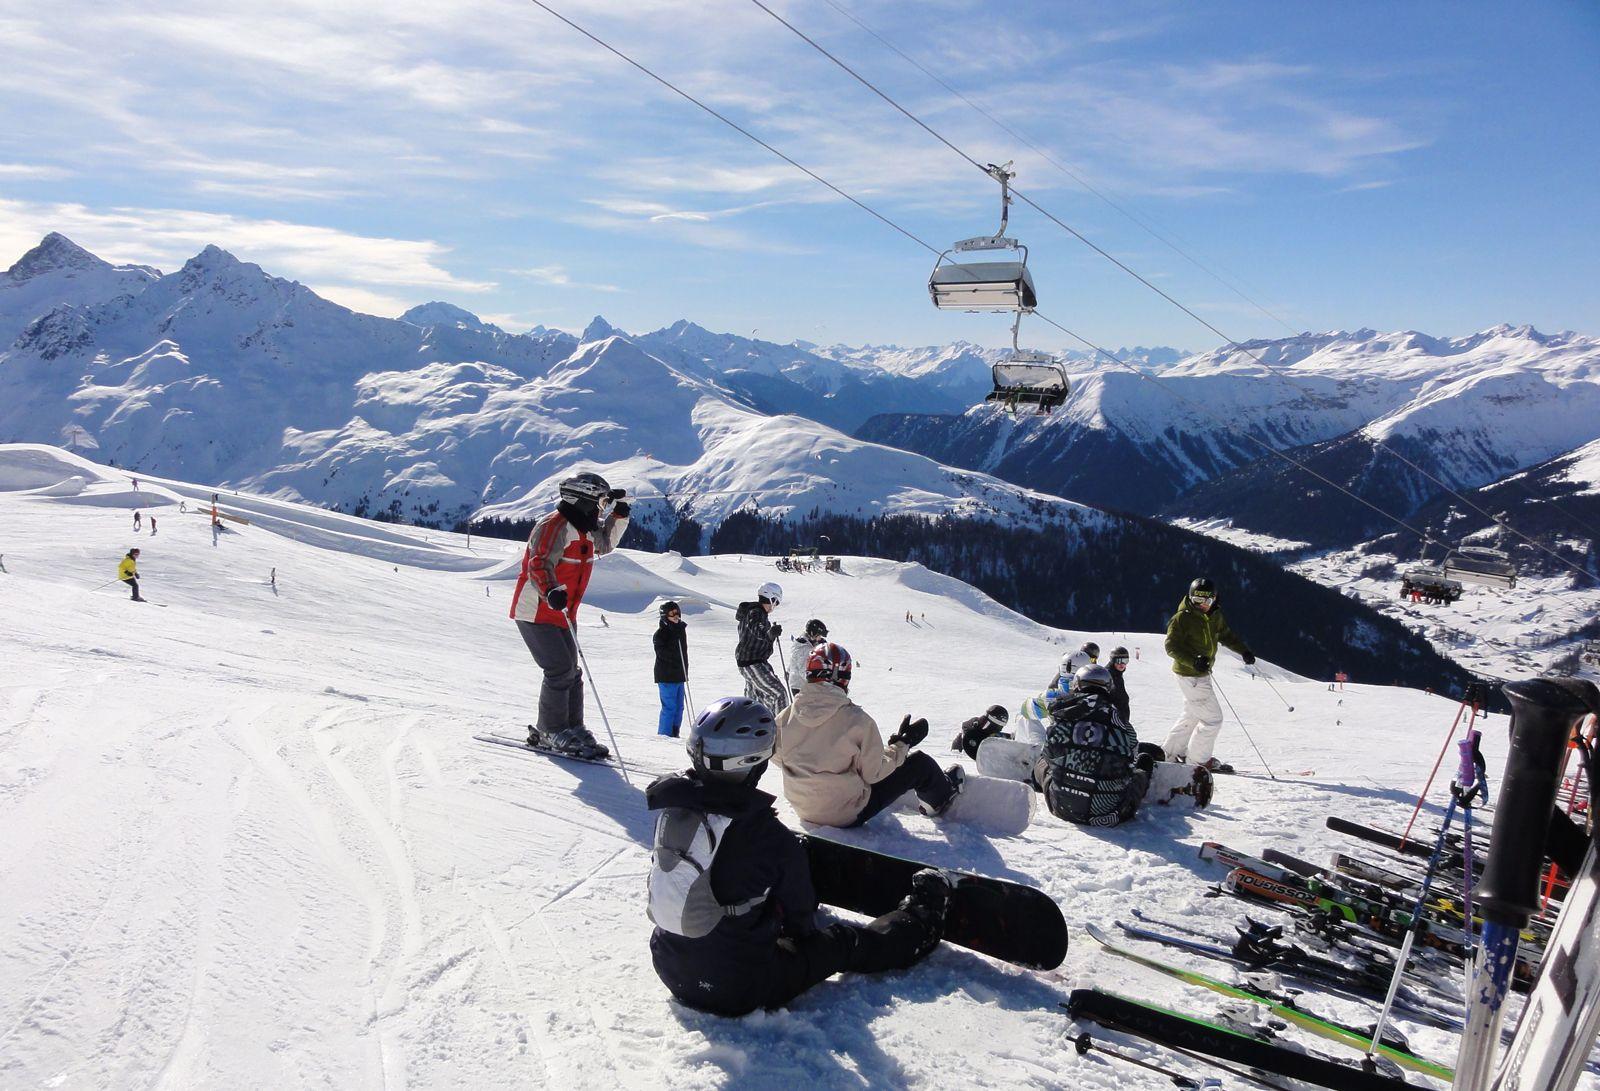 Davos, Jakobshorn http://www.lumipallo.fi/